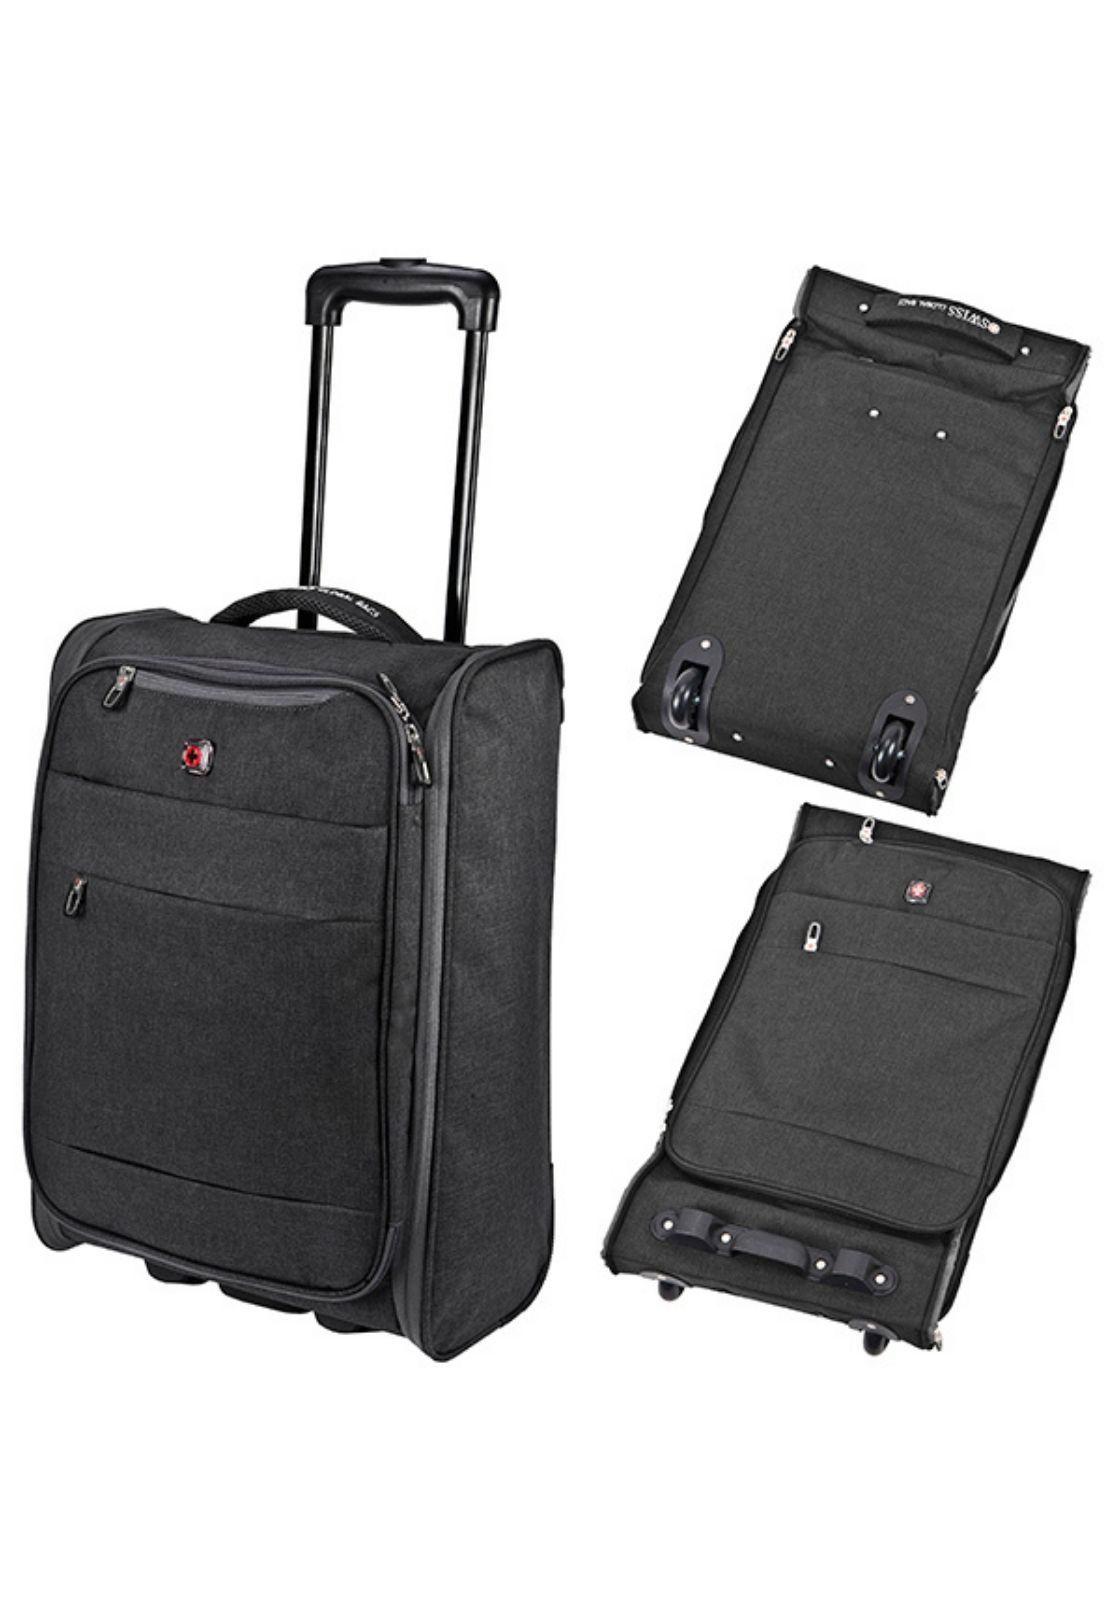 Mala De Viagem Dobrável Swiss Global Bag - 47623  - CROCKER JEANS